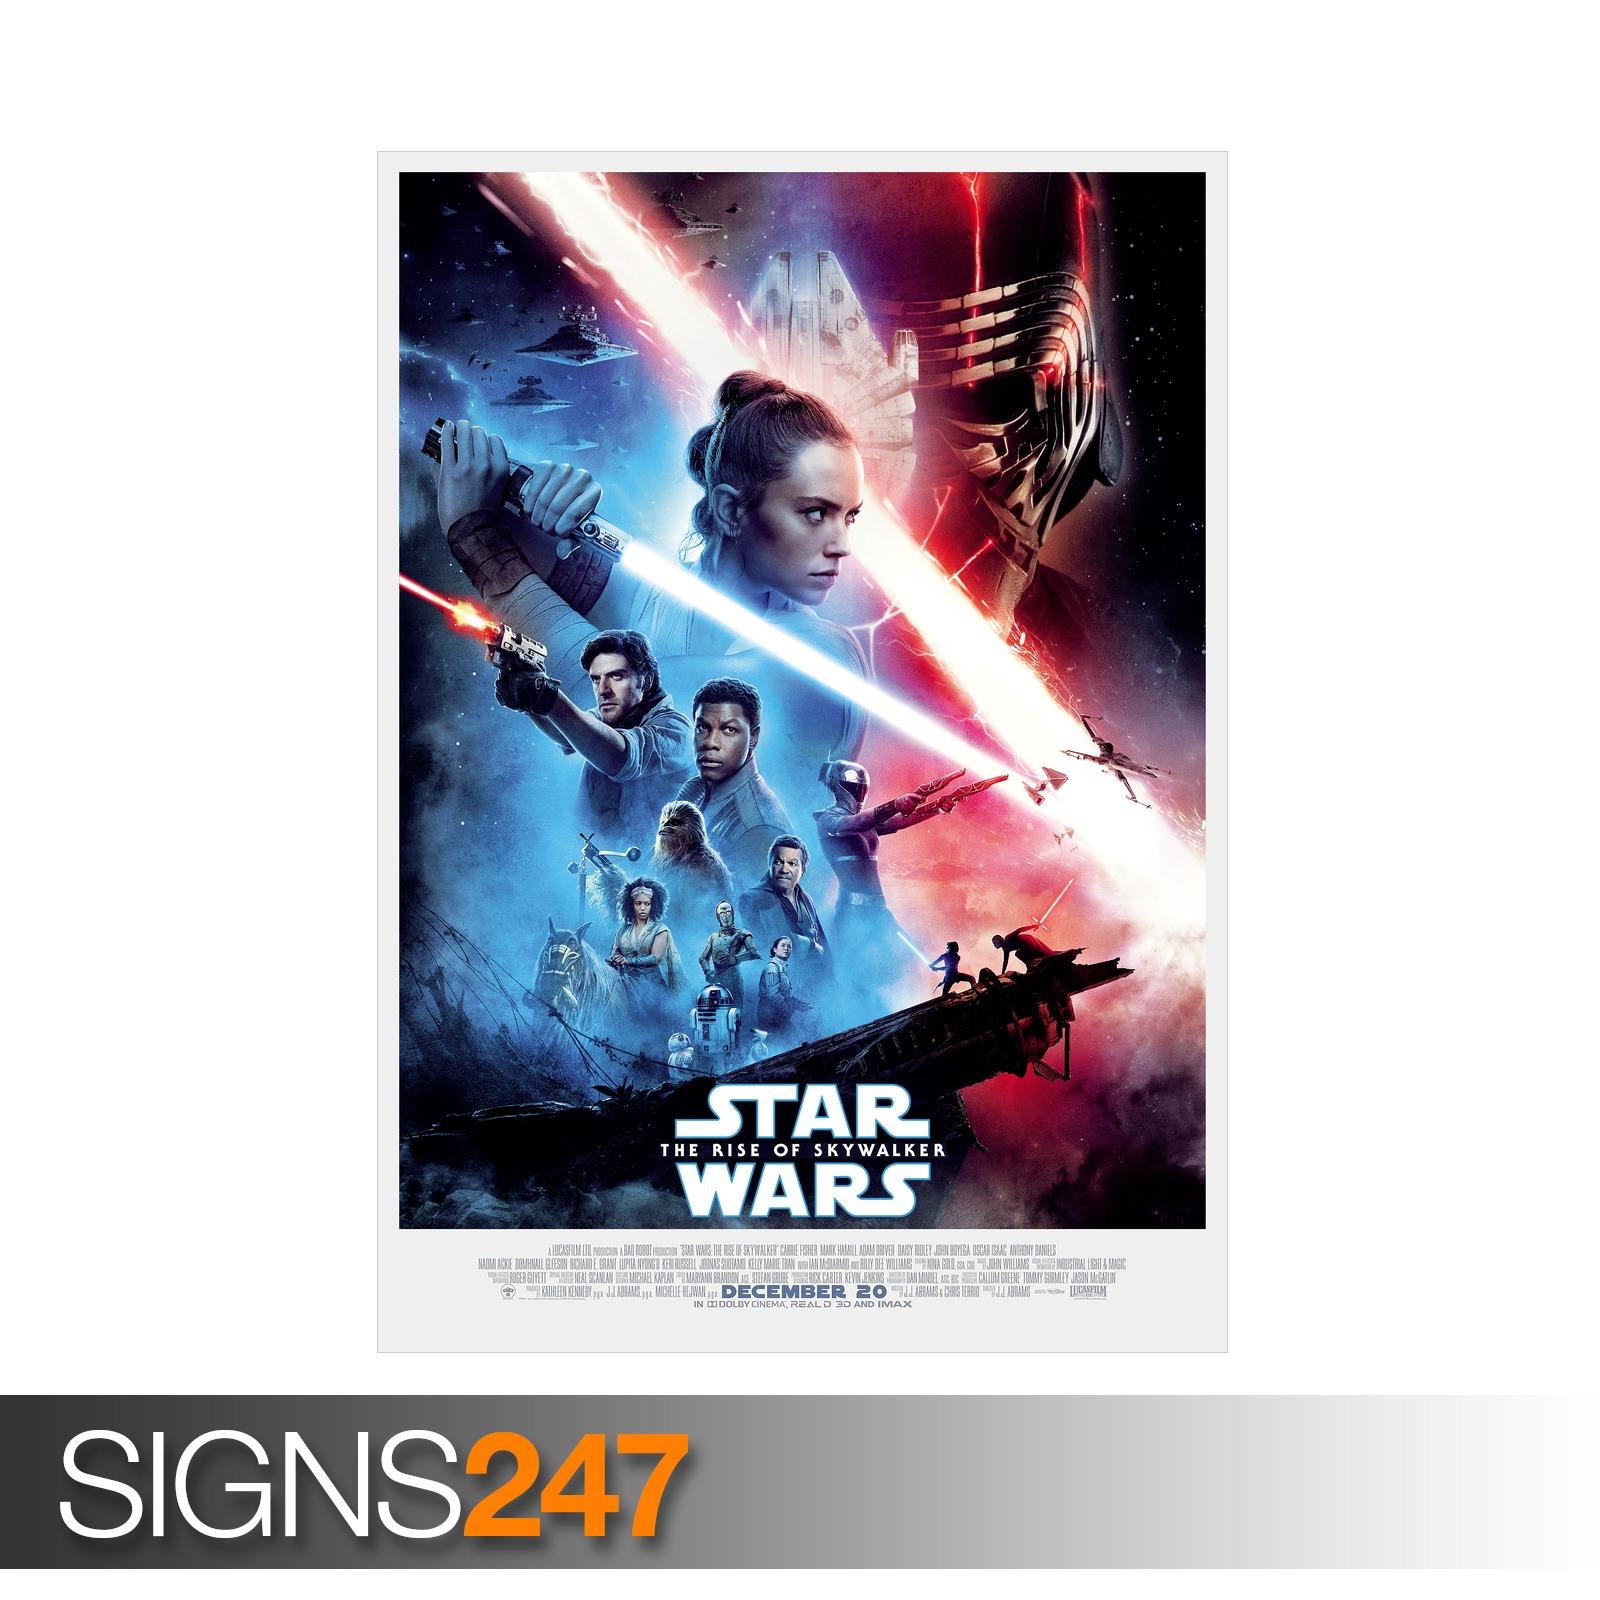 STAR-WARS-RISE-OF-SKYWALKER-POSTER-ZZ082-MOVIE-POSTER-Photo-Poster-Print-Art